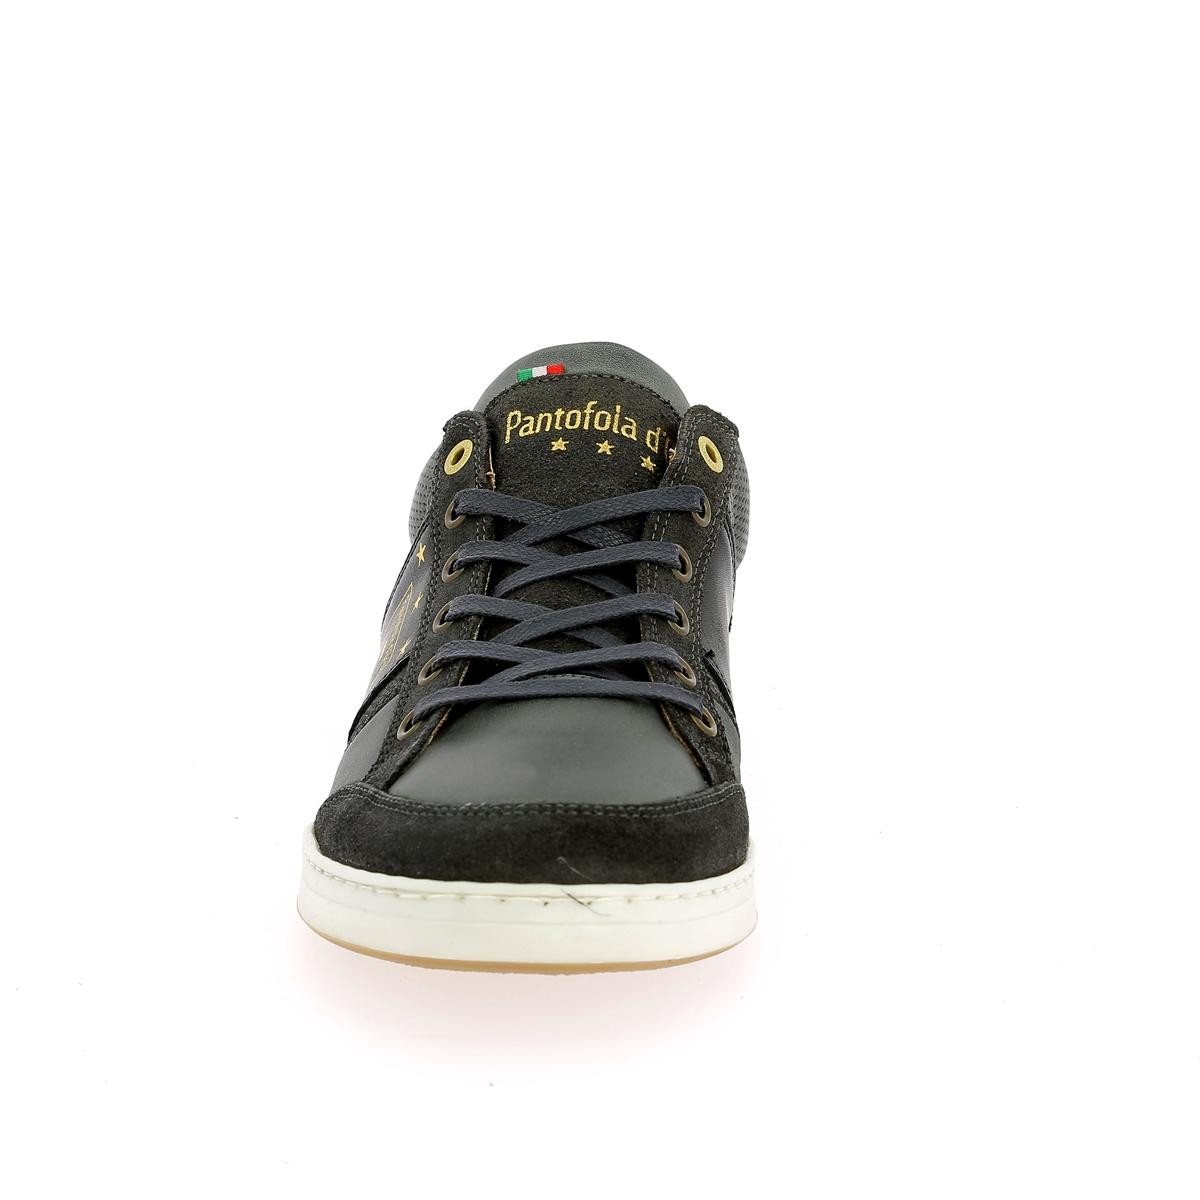 Pantofola D'oro Sneakers grijs